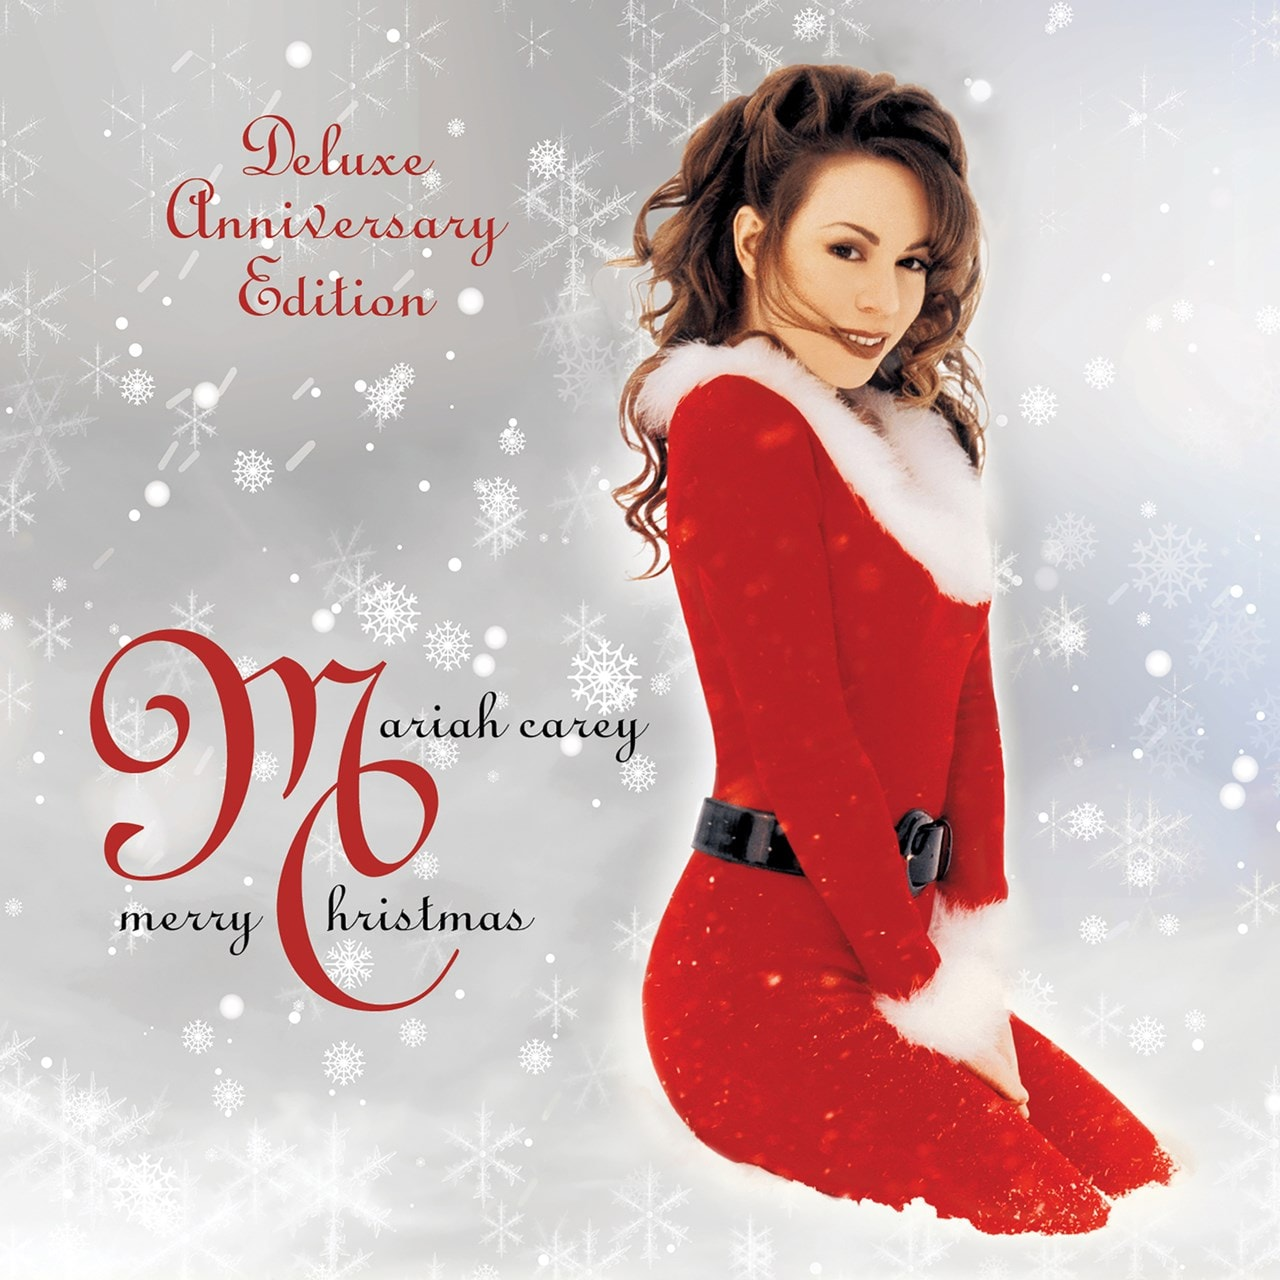 Merry Christmas - 1